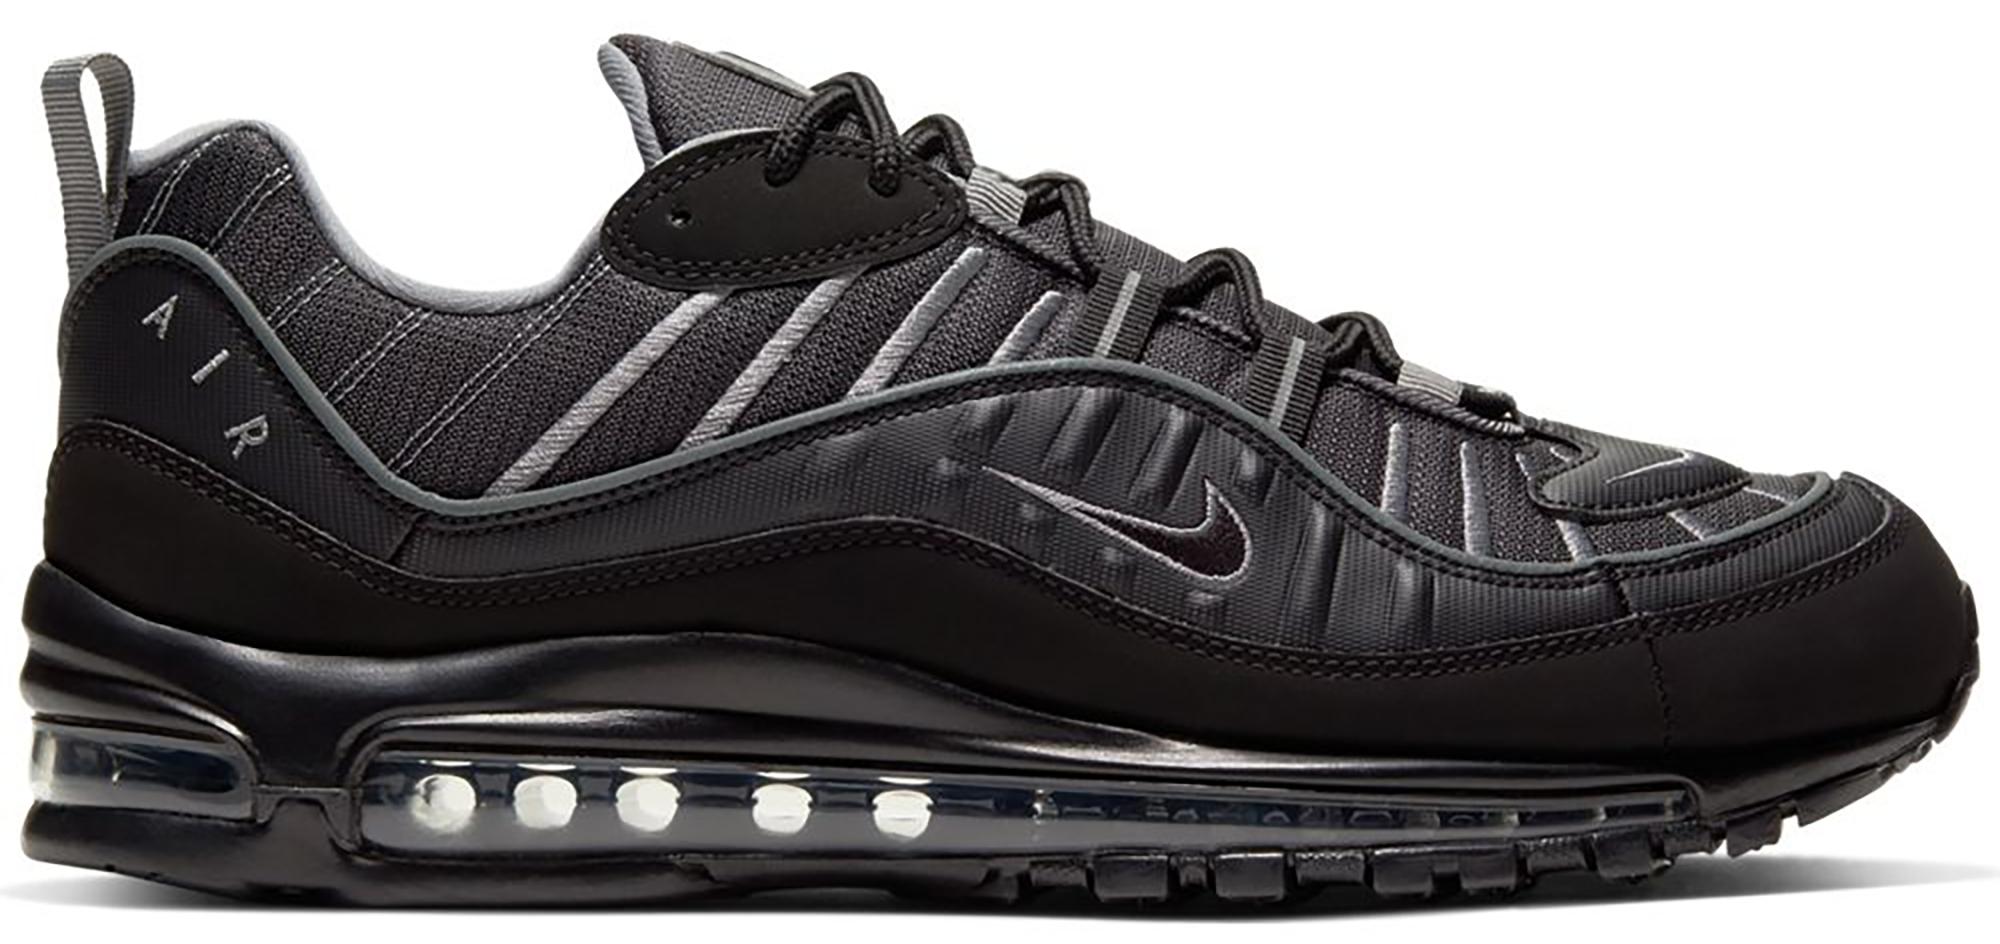 Nike Air Max 98 Black Smoke Grey